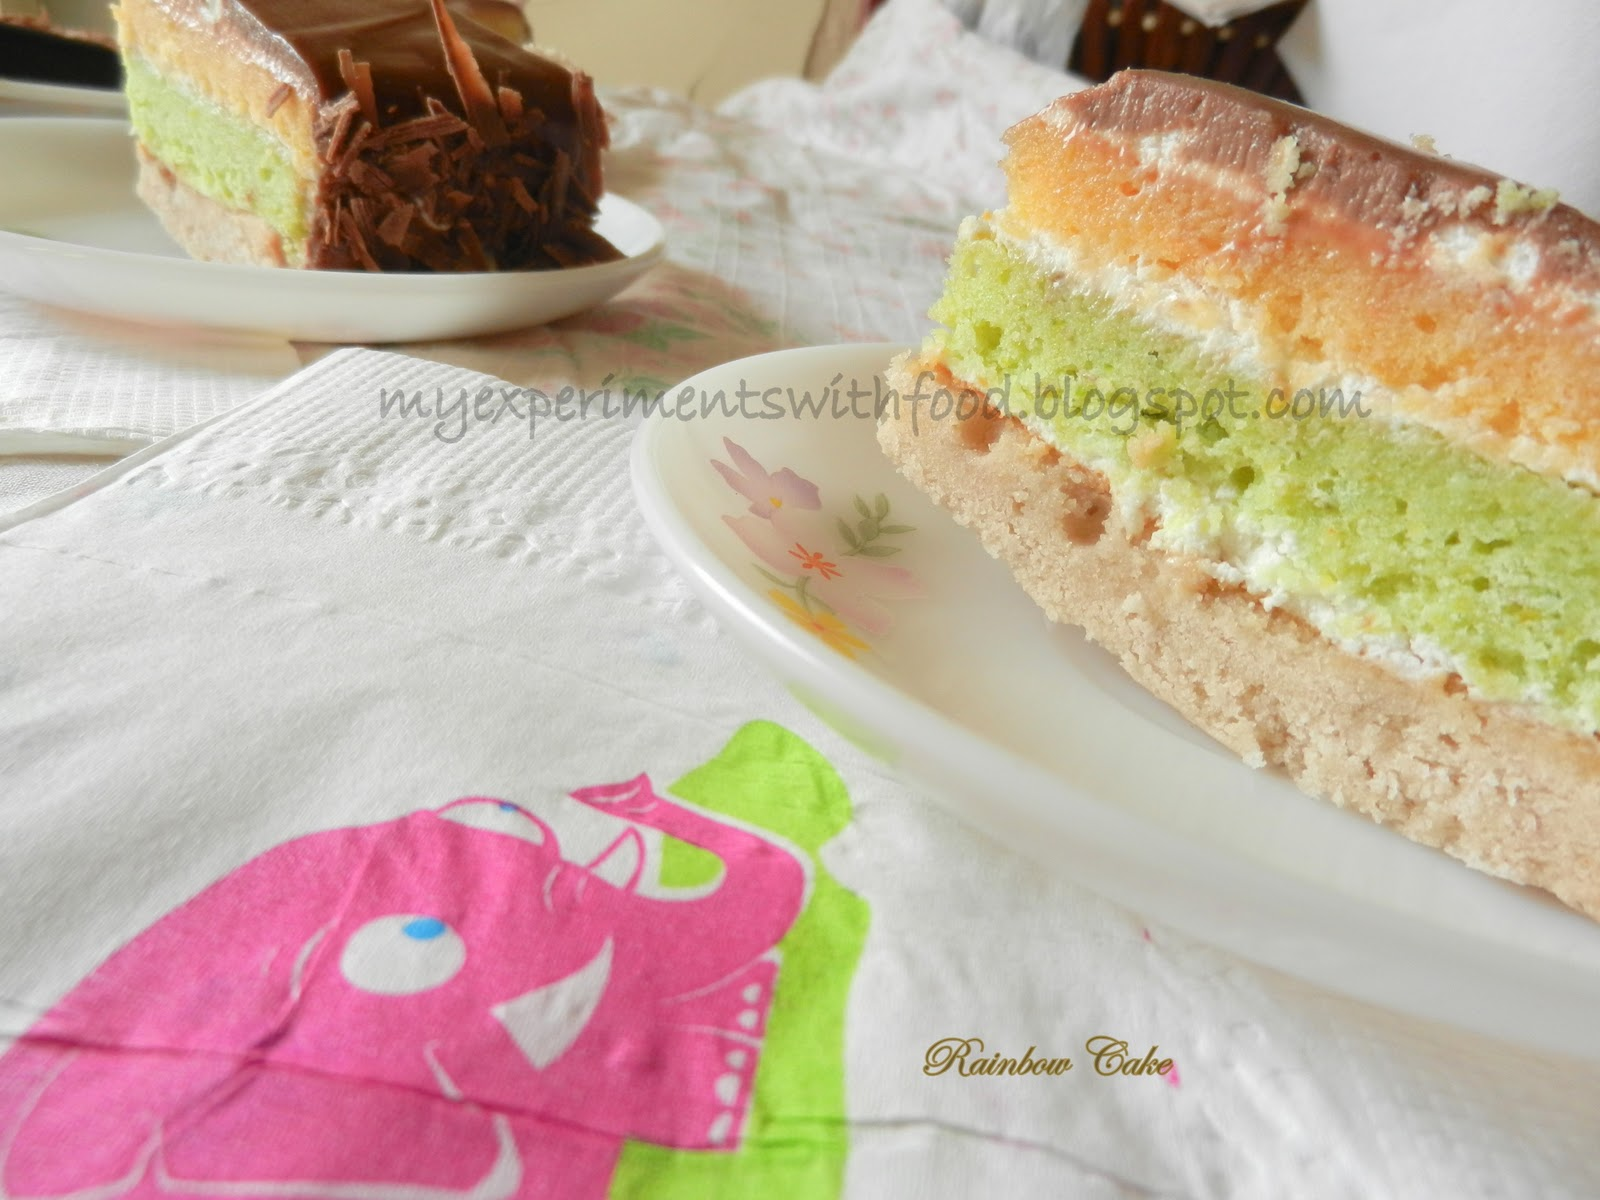 Rainbow Cake Recipe Joy Of Baking: My Experiments With Food: Joan's Rainbow Cake